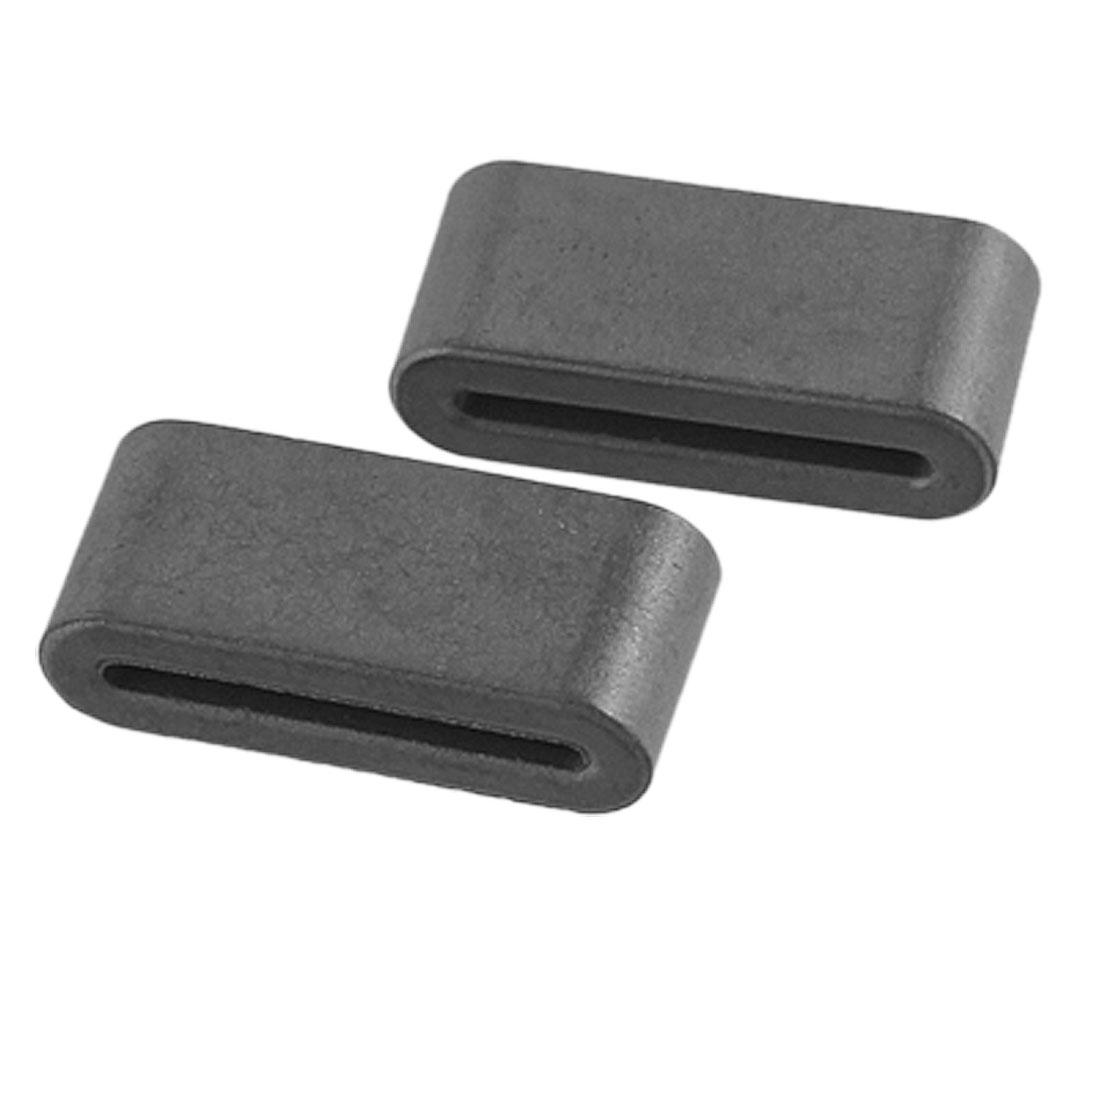 6 Pcs Transformer 14 x 1.5mm Insert Slot Ferrite Flat Cable Cores